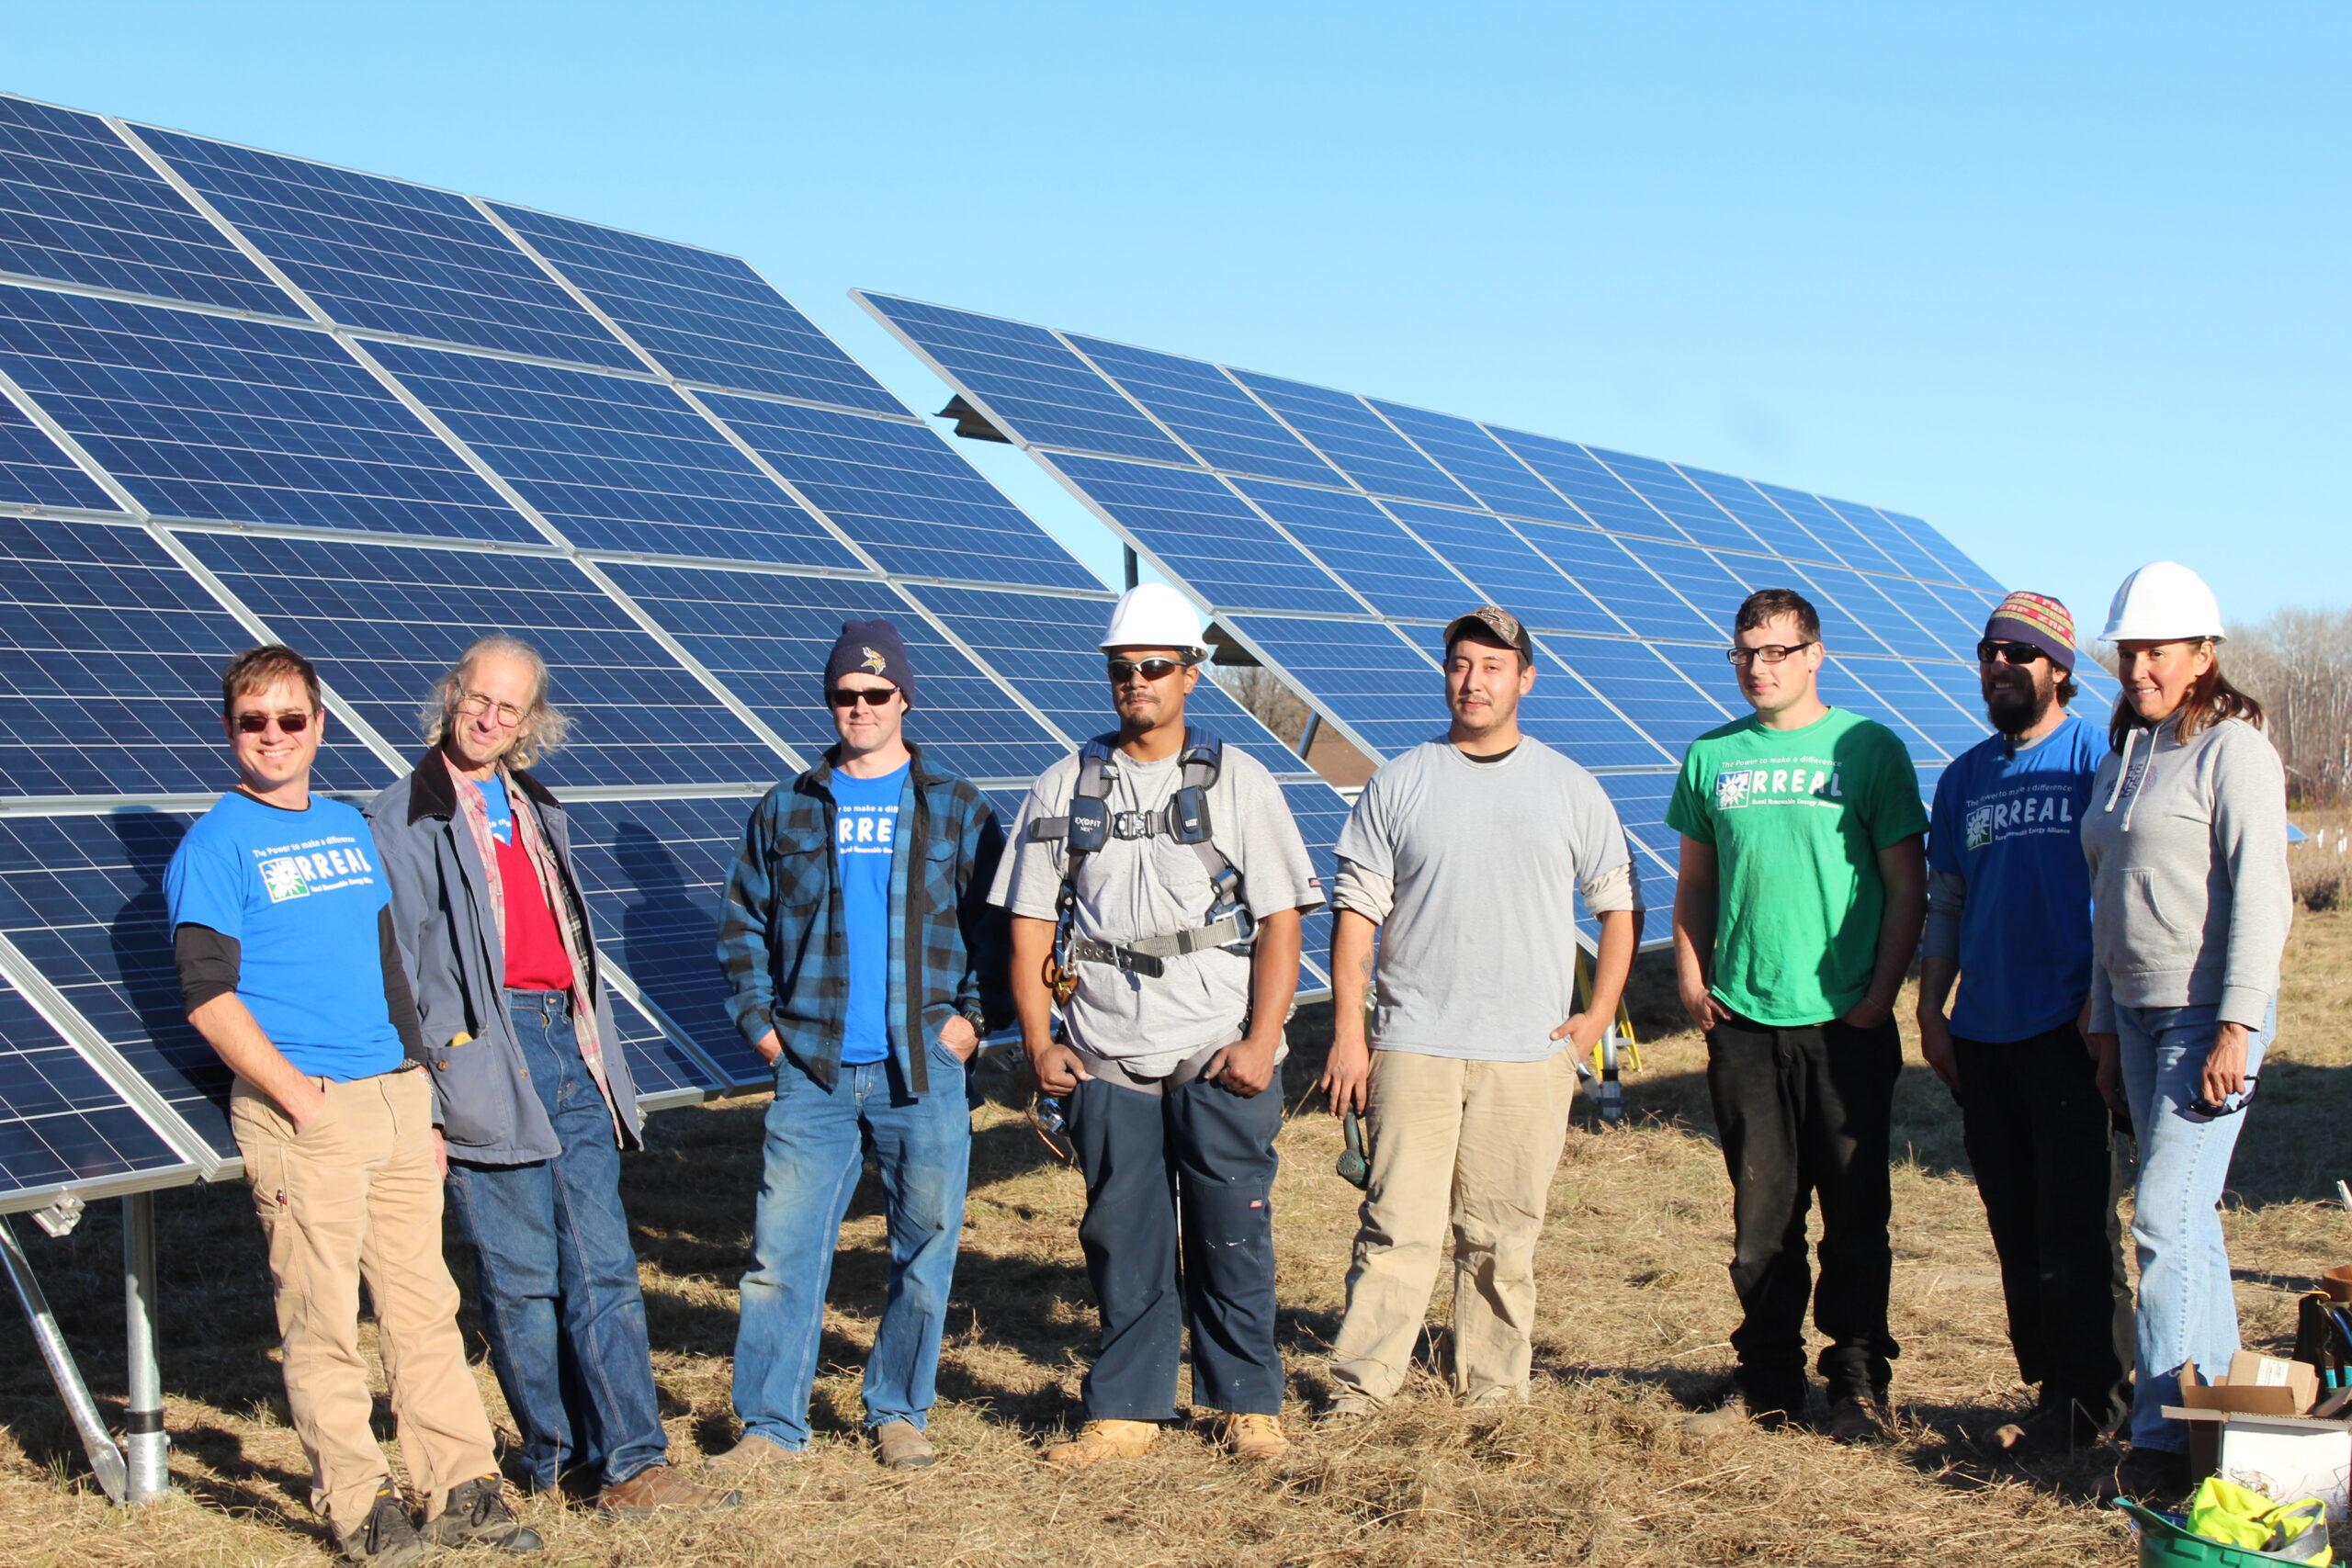 Colorado passes energy justice and solar legislation